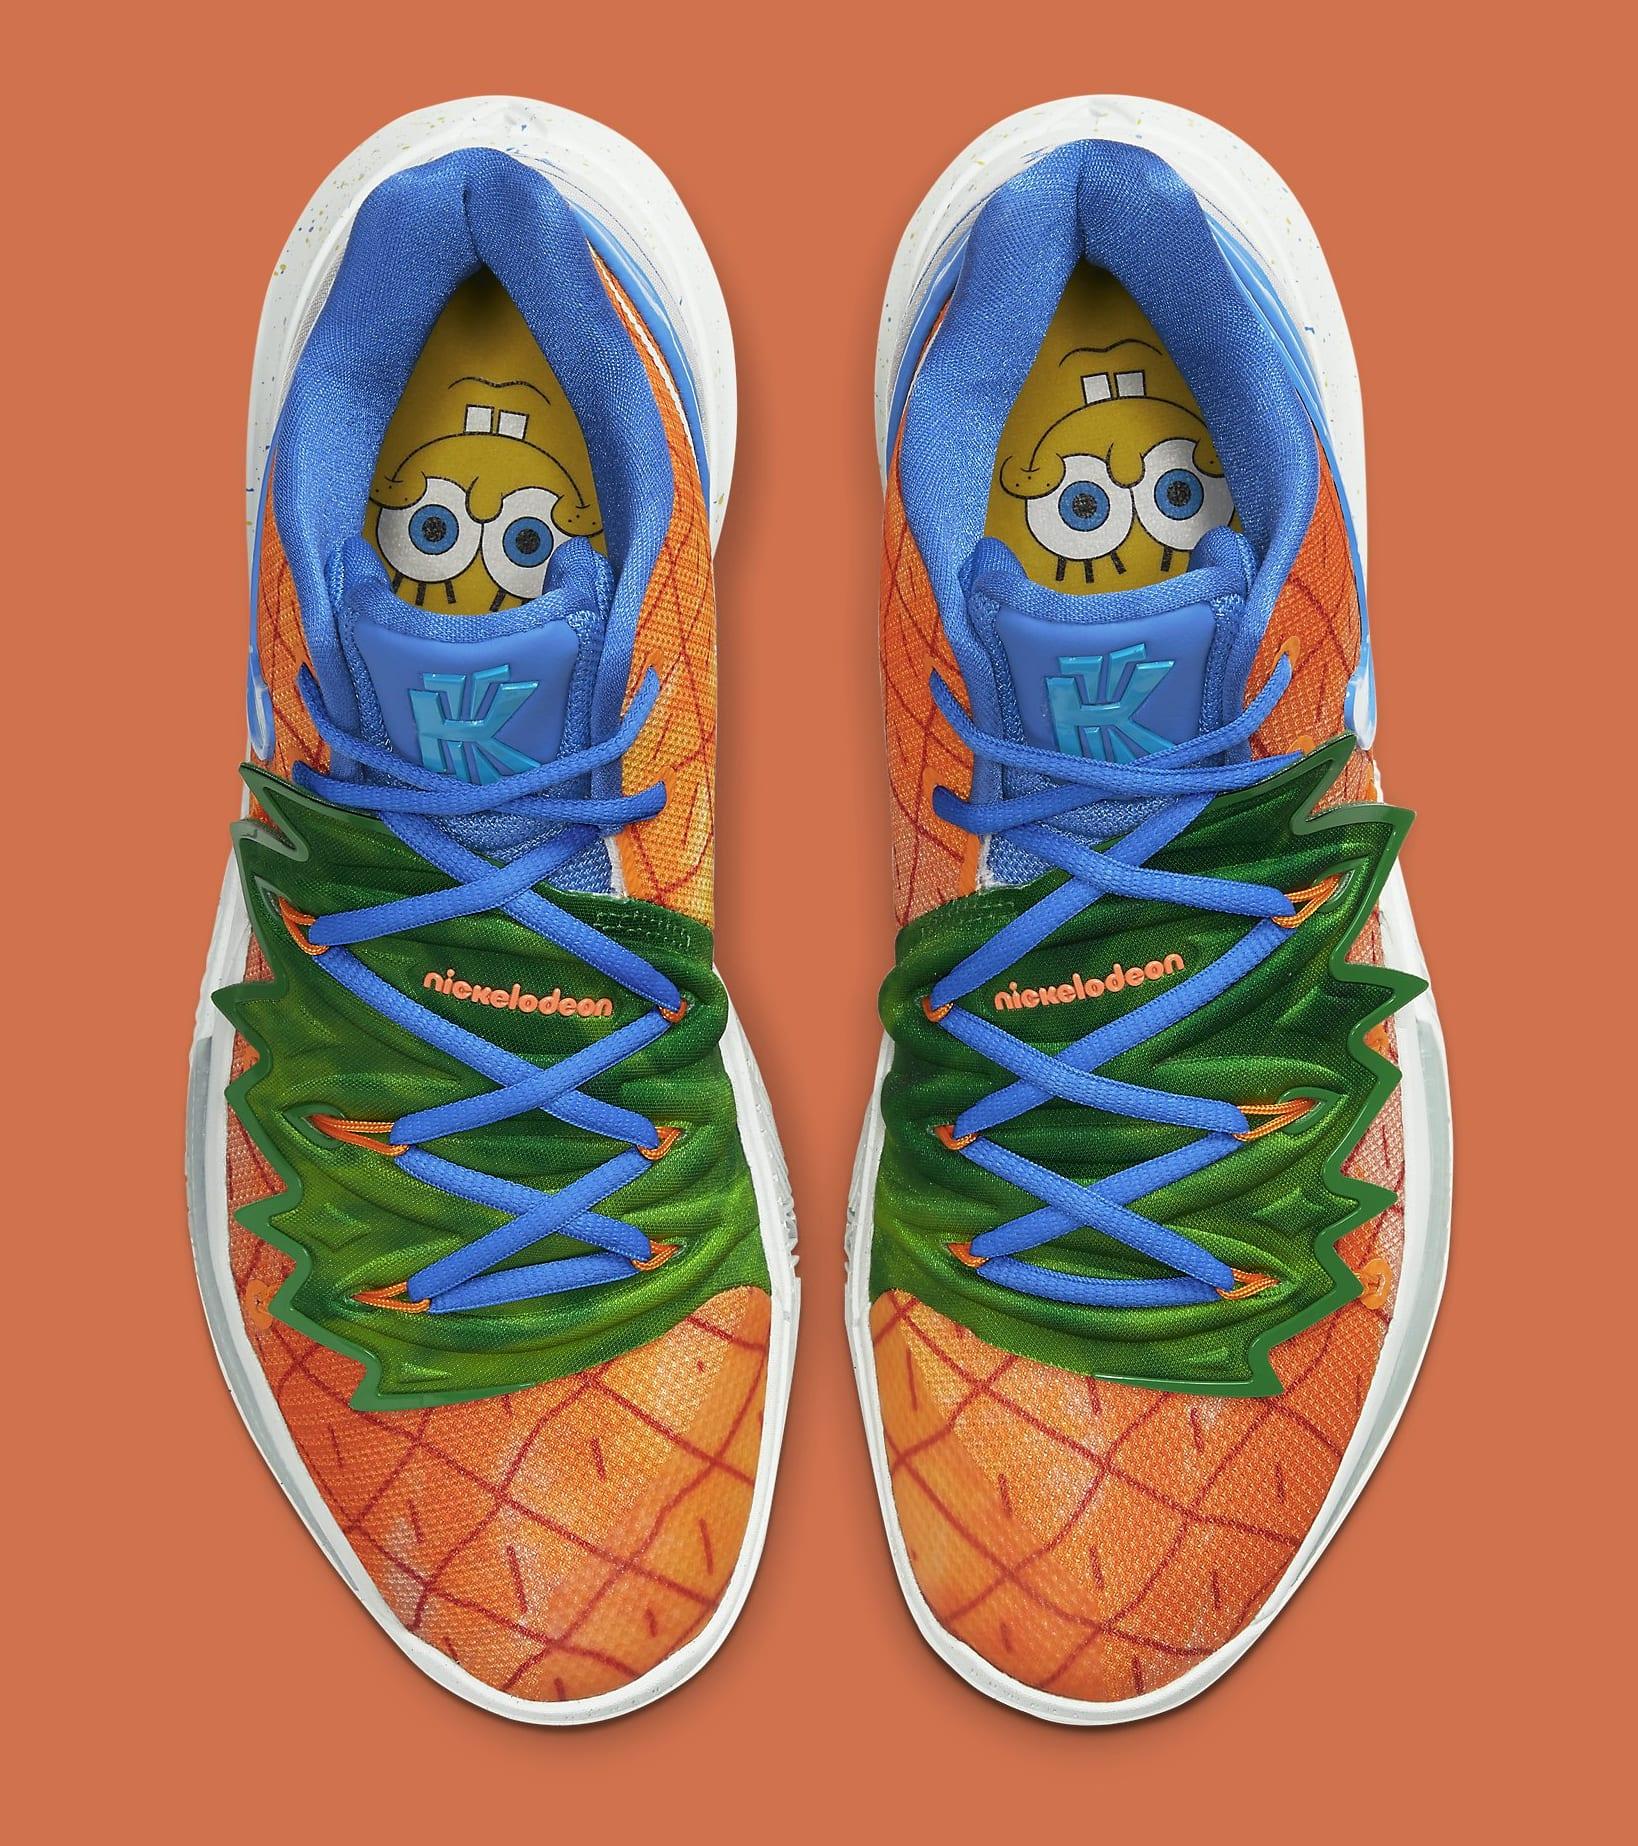 spongebob-nike-kyrie-5-pineapple-house-cj6951-800-top